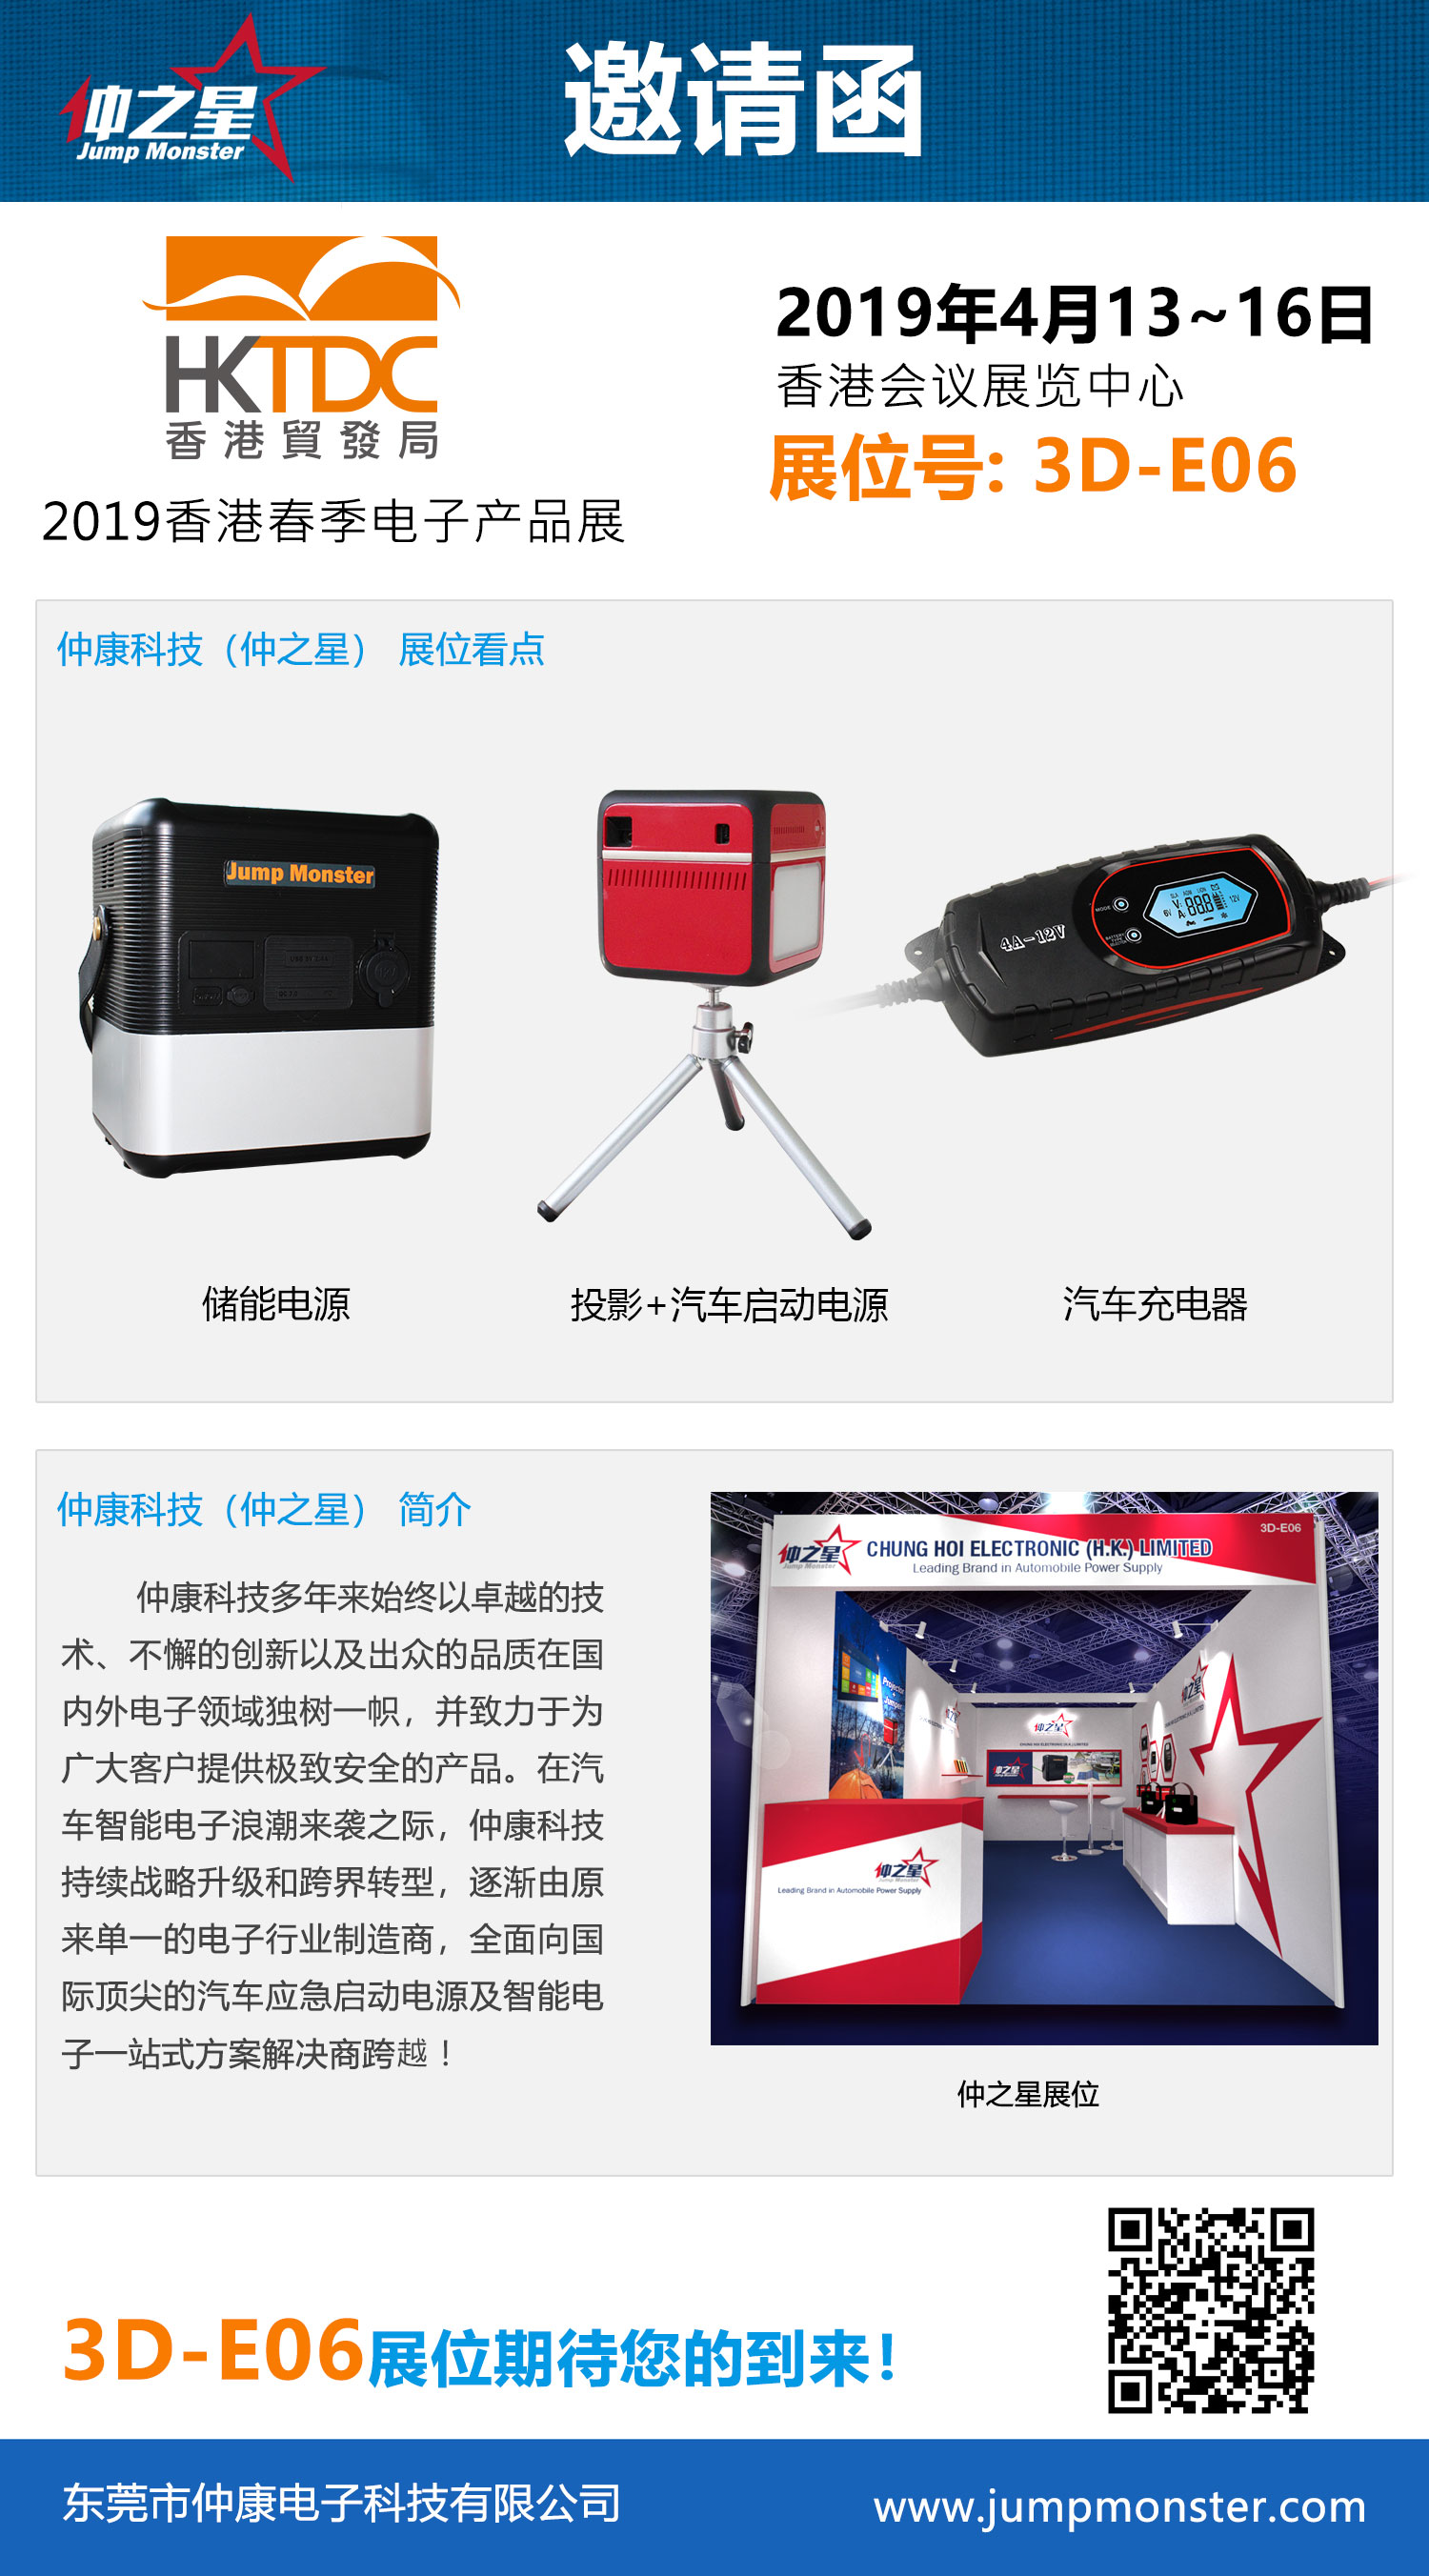 JUMP MONSTER&仲之星2019香港春季电子产品展